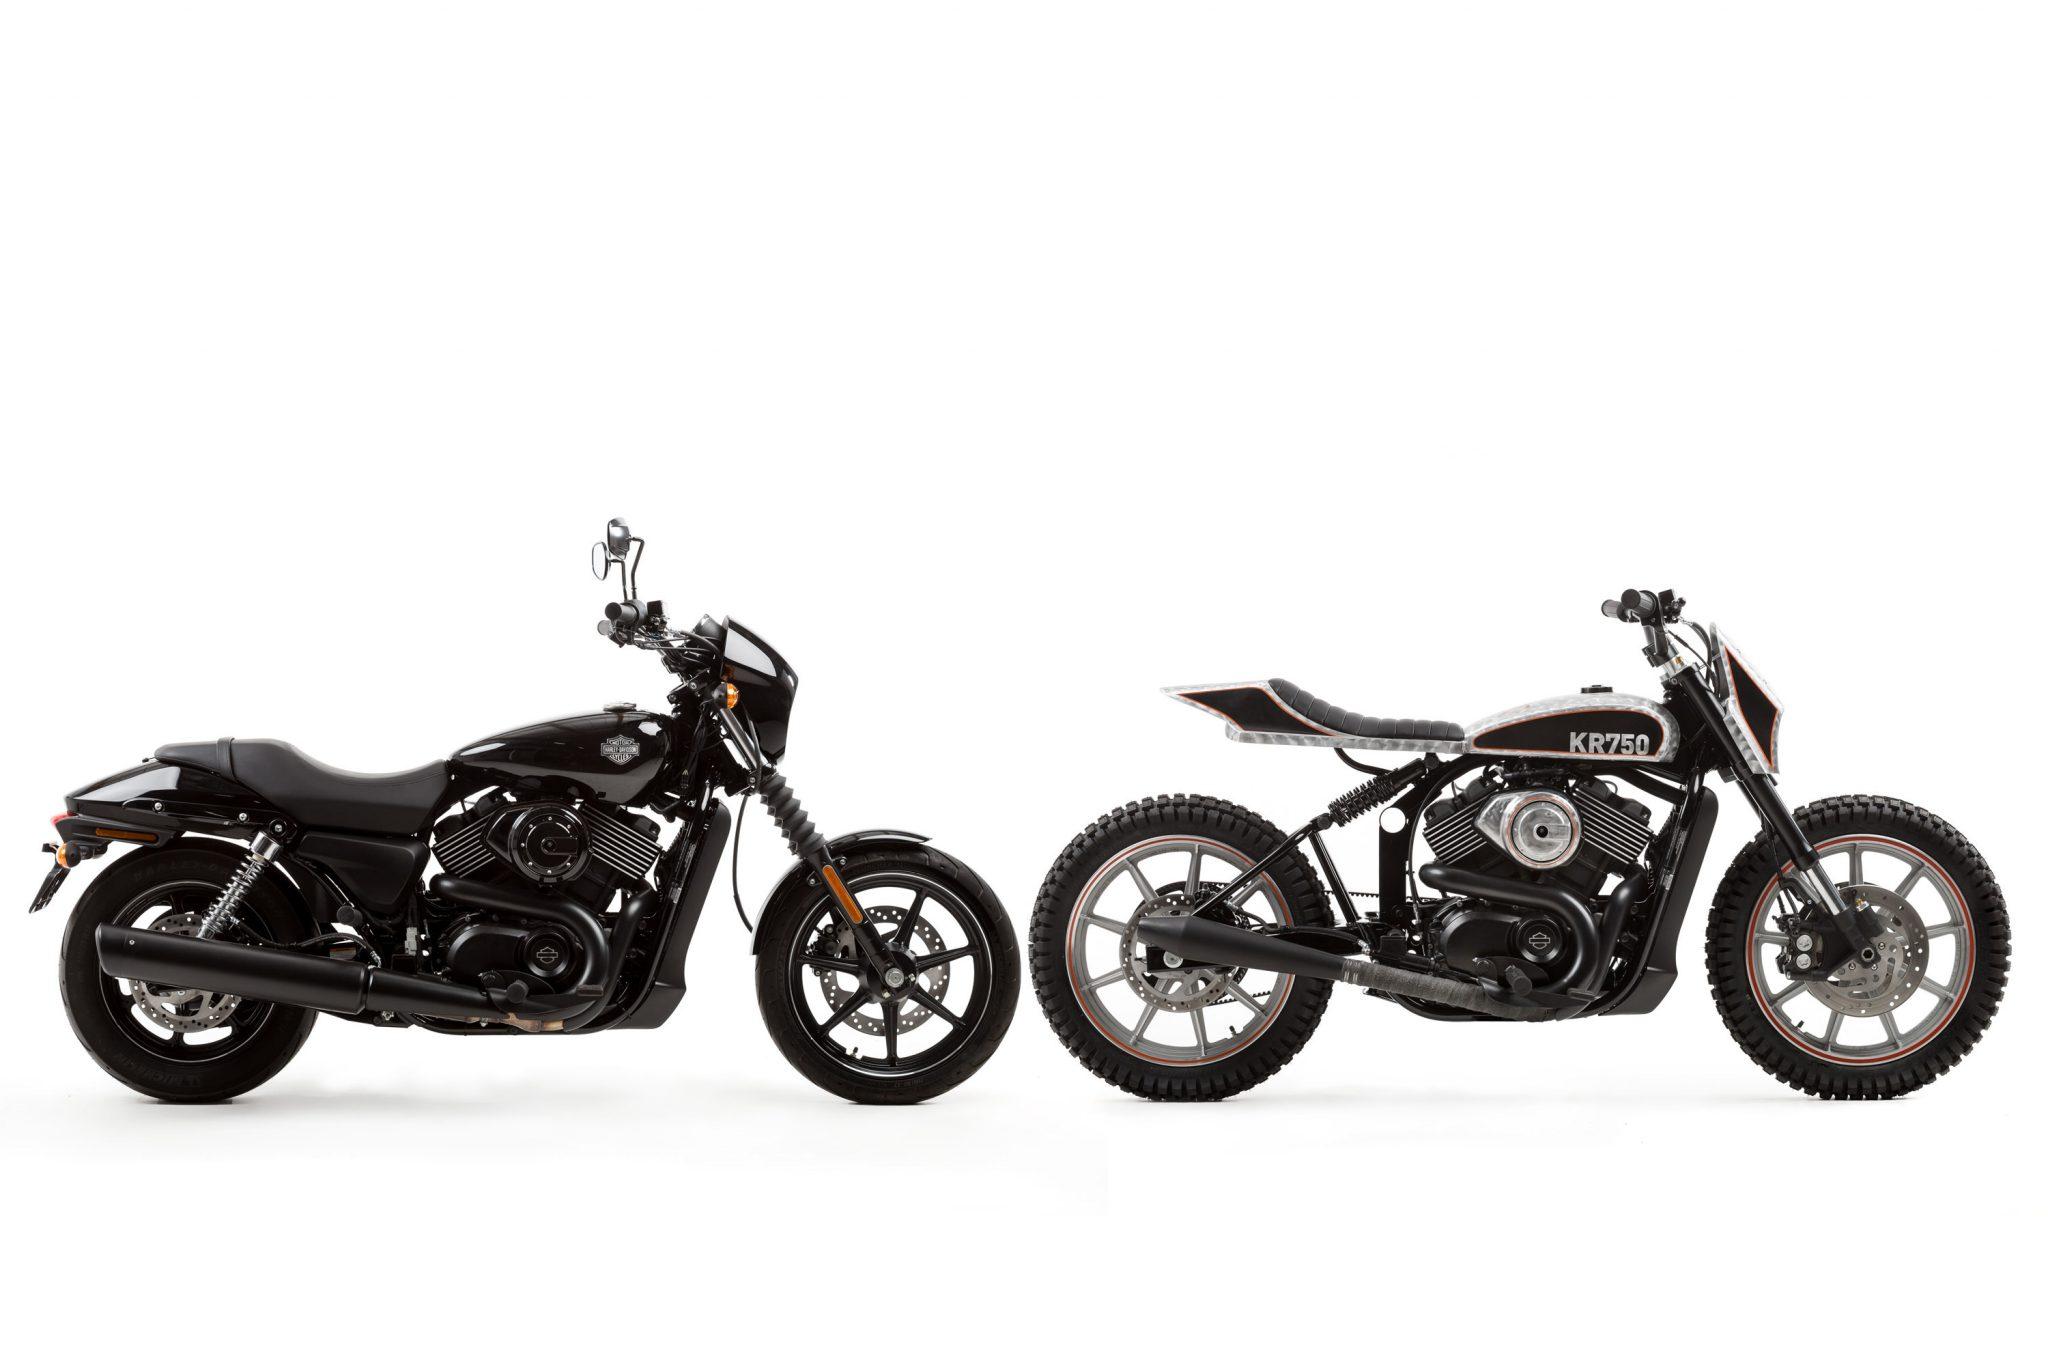 Harley Davidson: For Motorcycle Fans: Harley-Davidson Street 750 Tracker